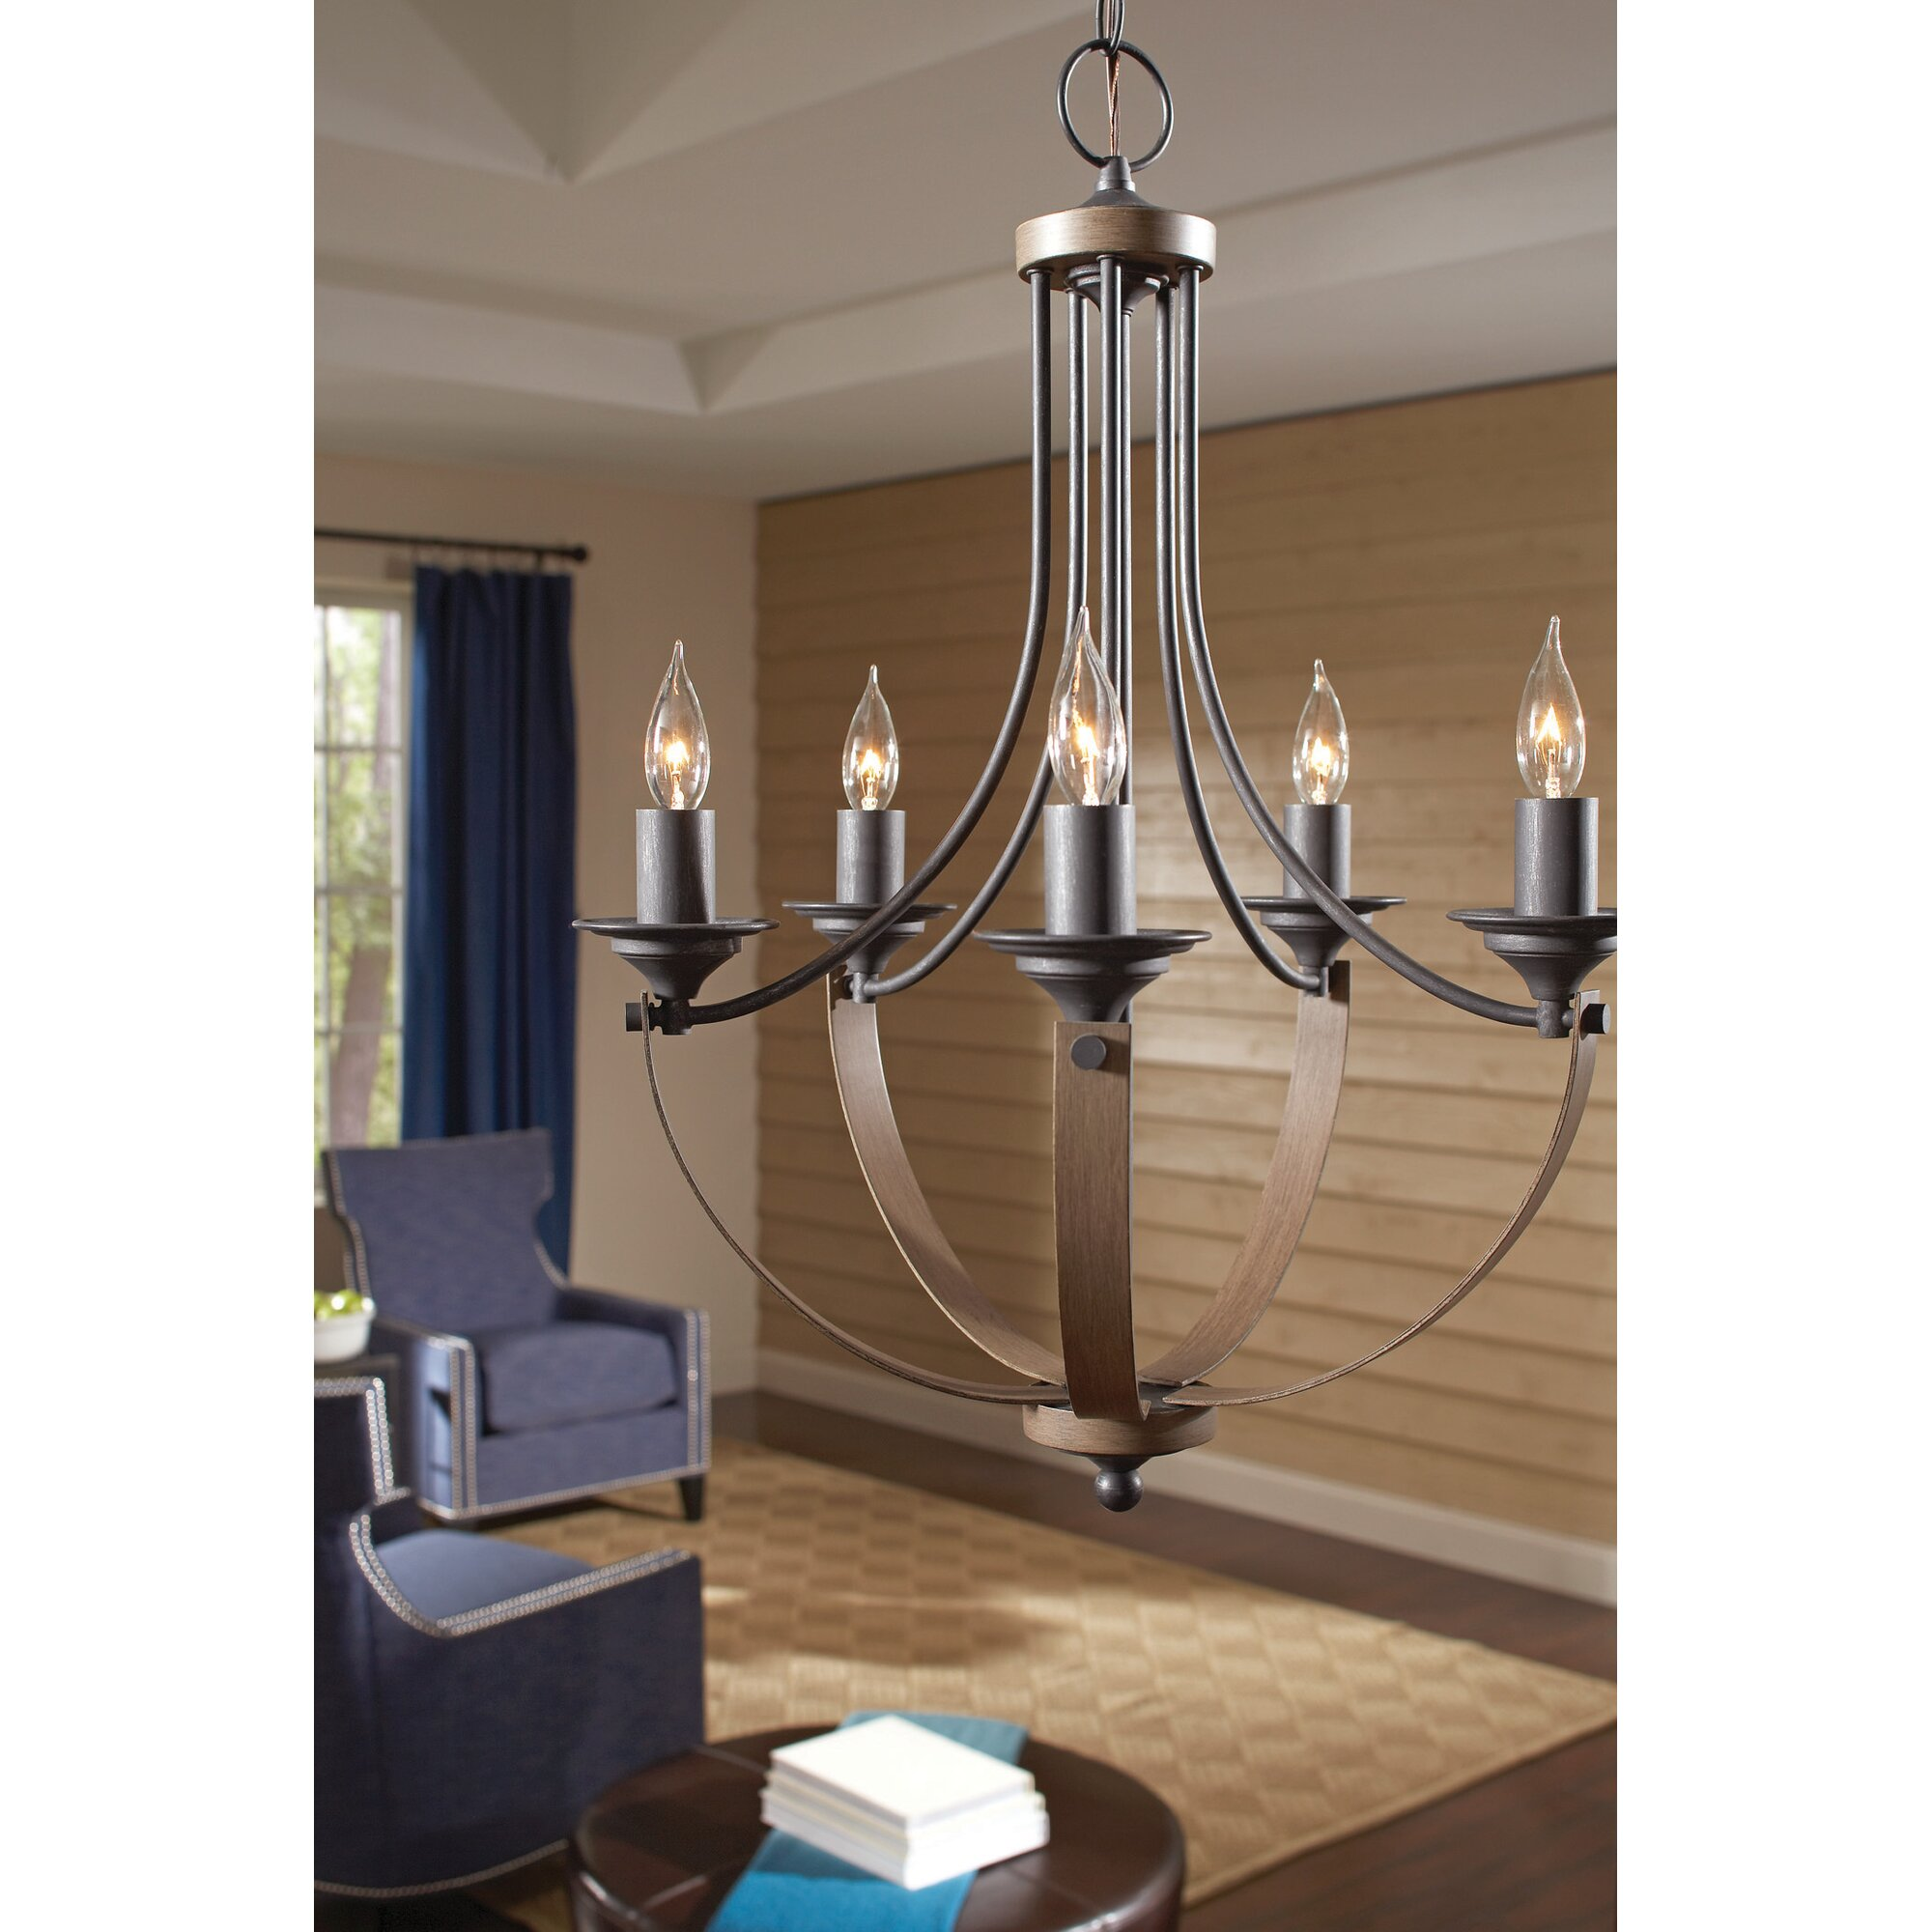 Birch lane camilla 9 light candle style chandelier for Luminaires suspendus salle manger